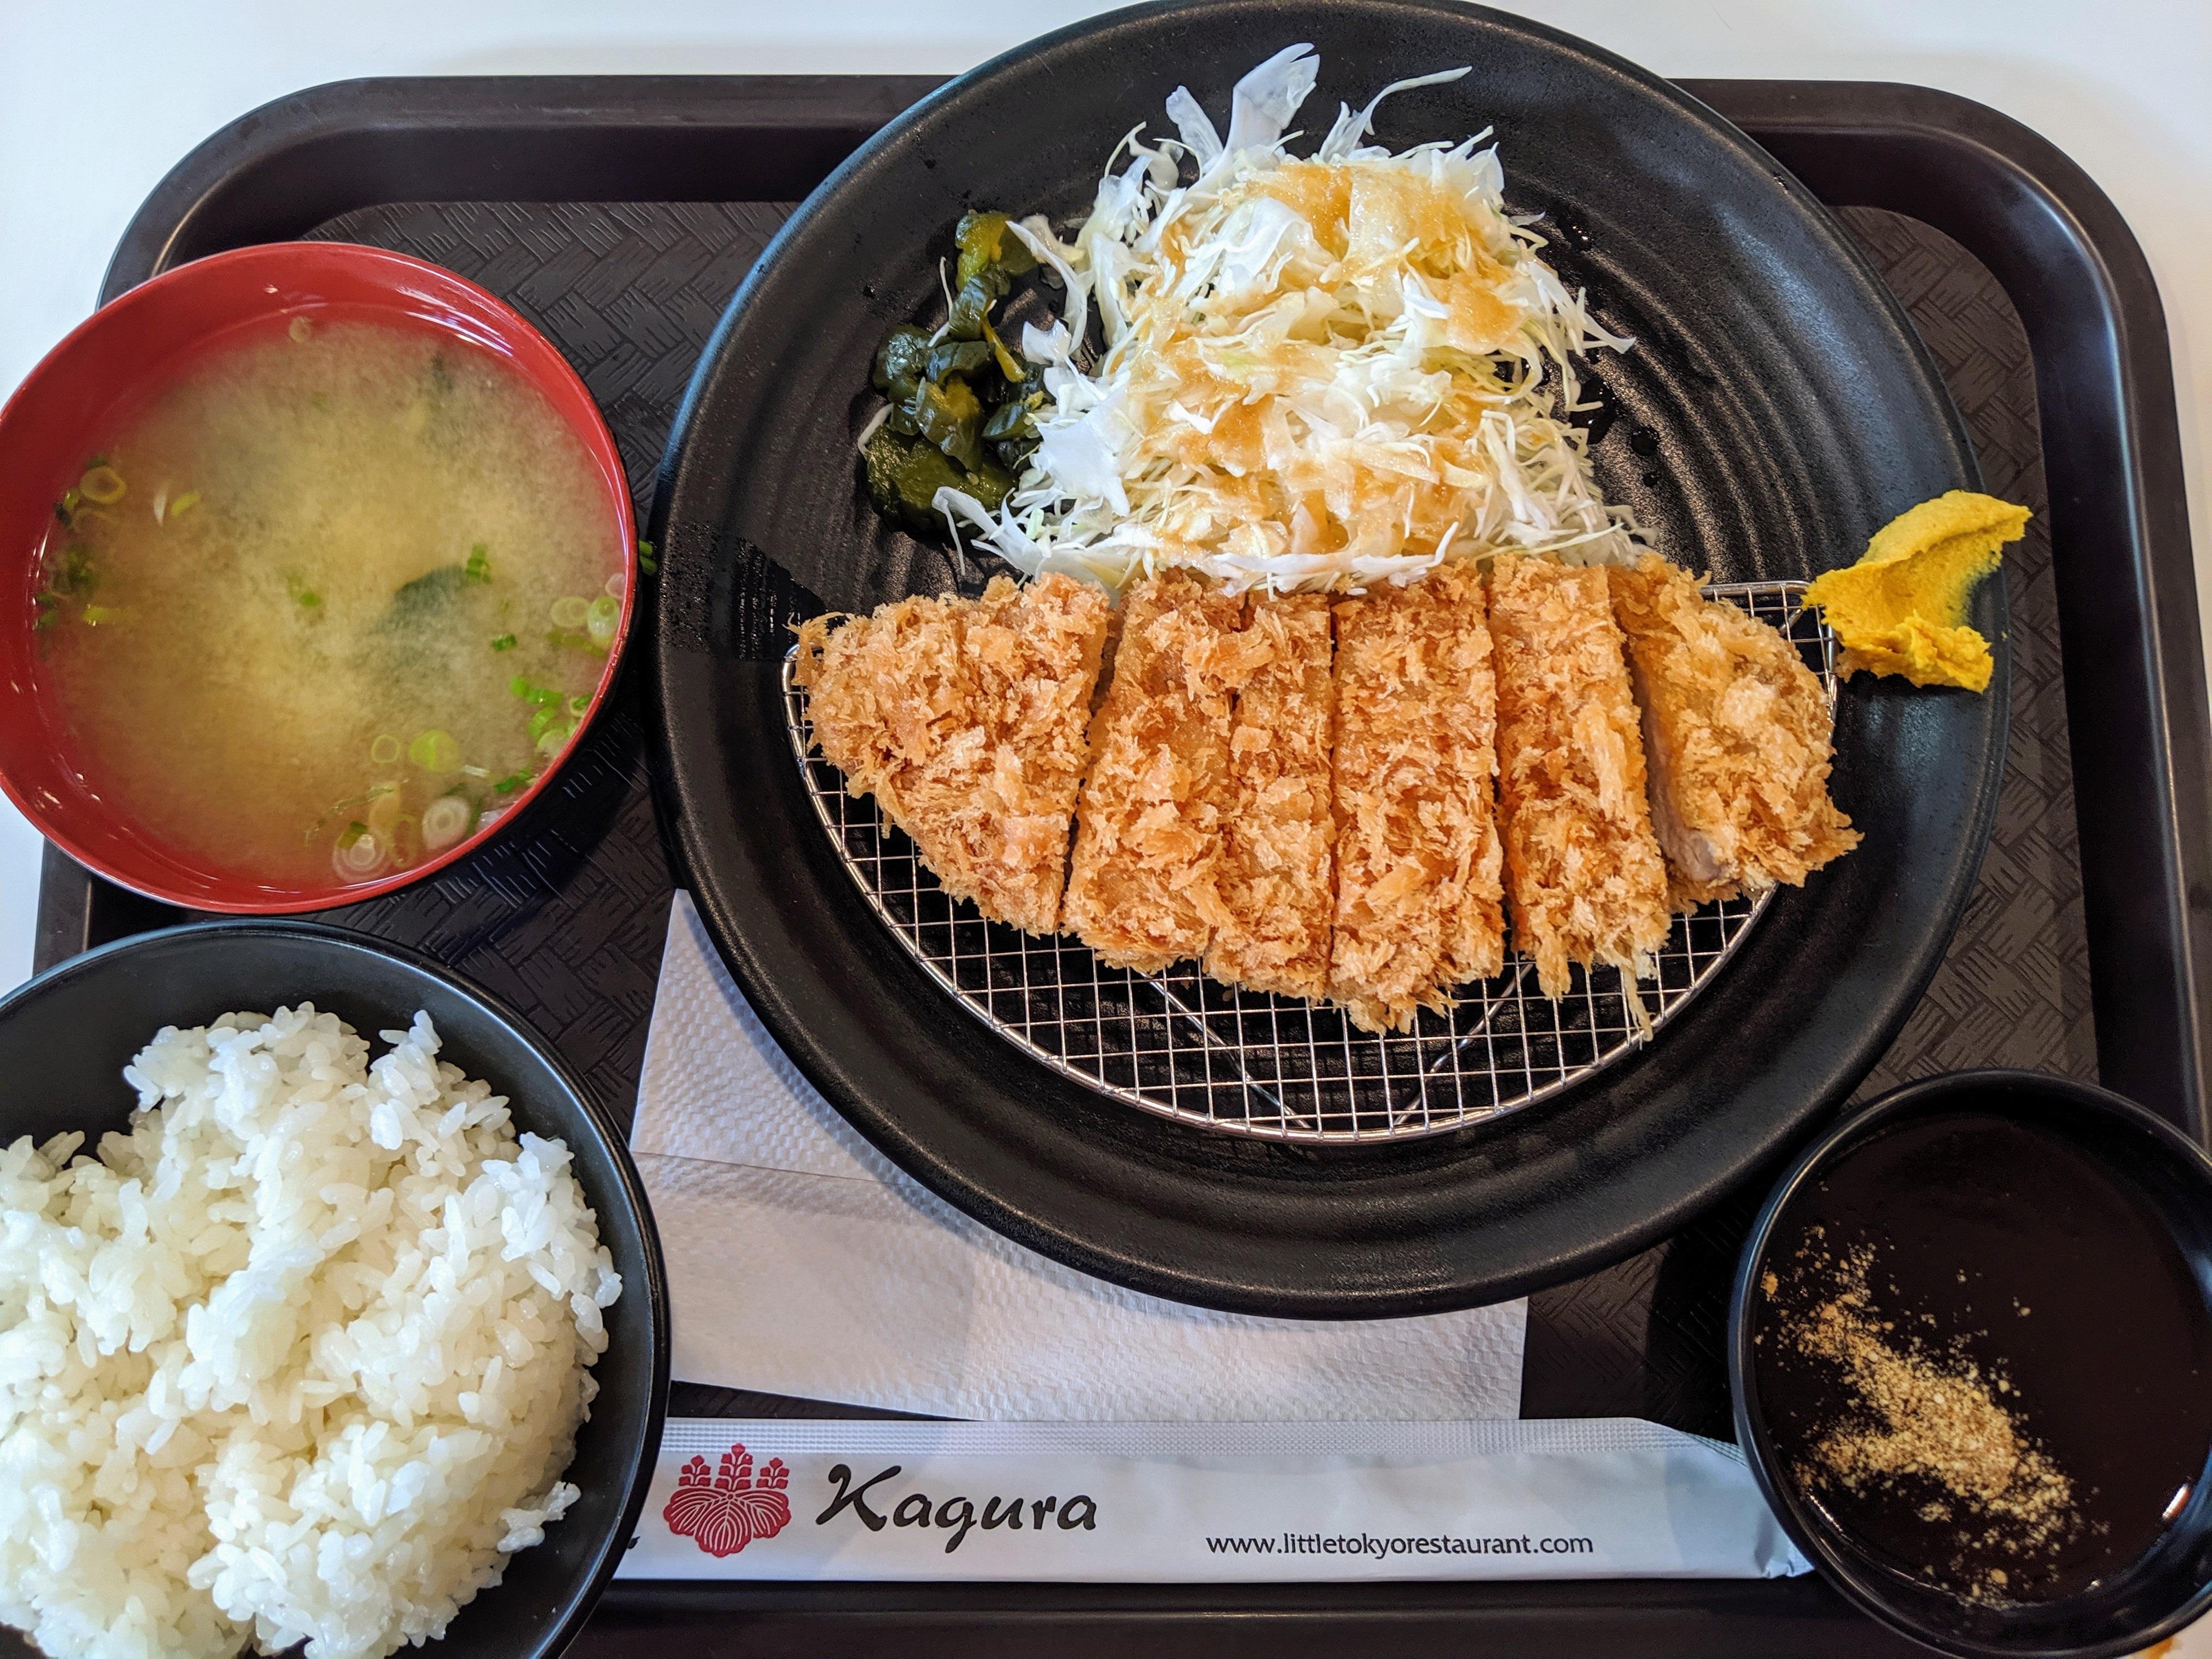 Tonkatsu set at Kagura Gardena with fried pork, steamed rice, and miso soup on a plastic tray.